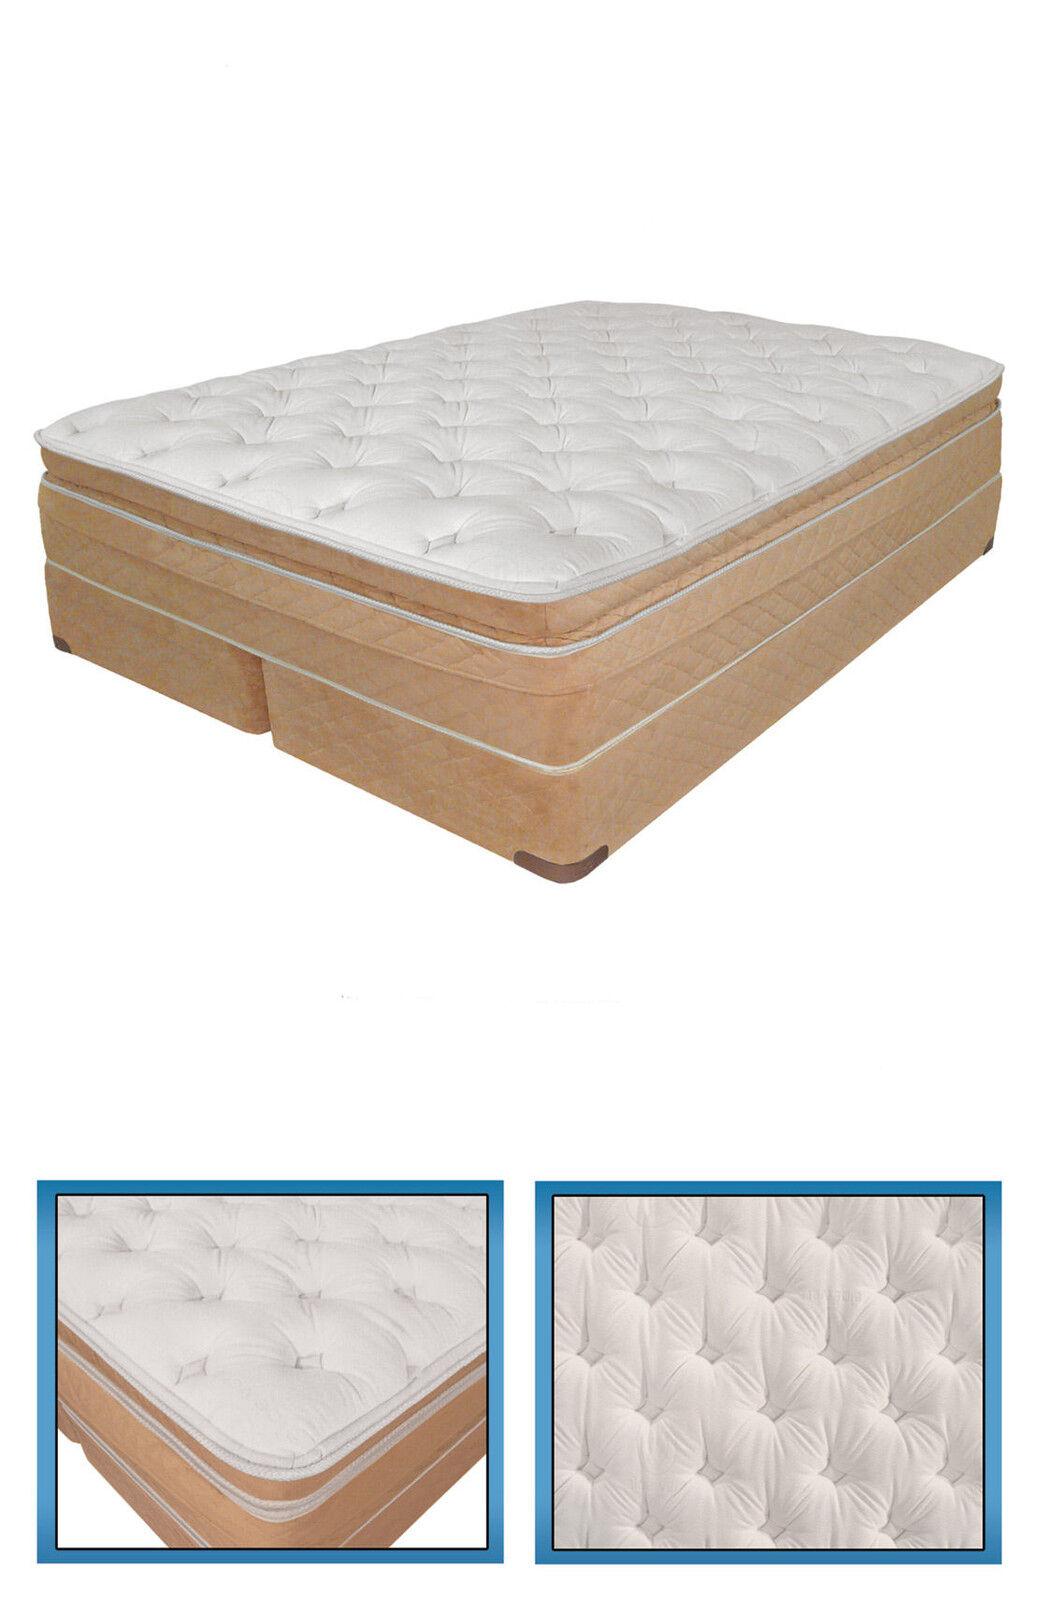 Sleep Rize Contemporary Ii Adjustable Bed 12 Innomax Mystique Air Mattress For Sale Online Ebay